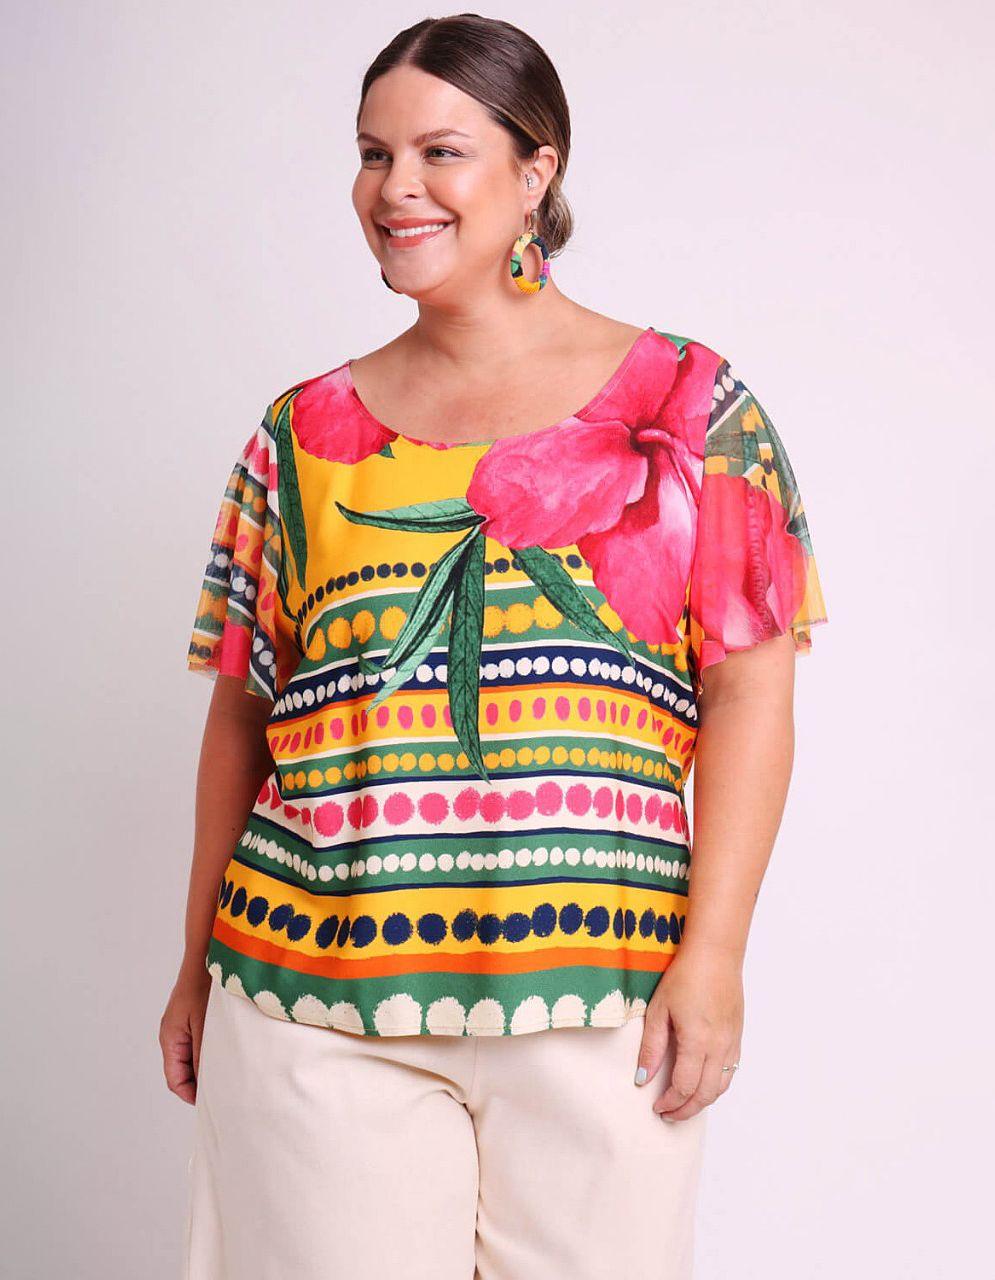 Blusa talla grande amarilla o rosa de verano estampada con manga corta de tul Malagueta-57644MAL-B